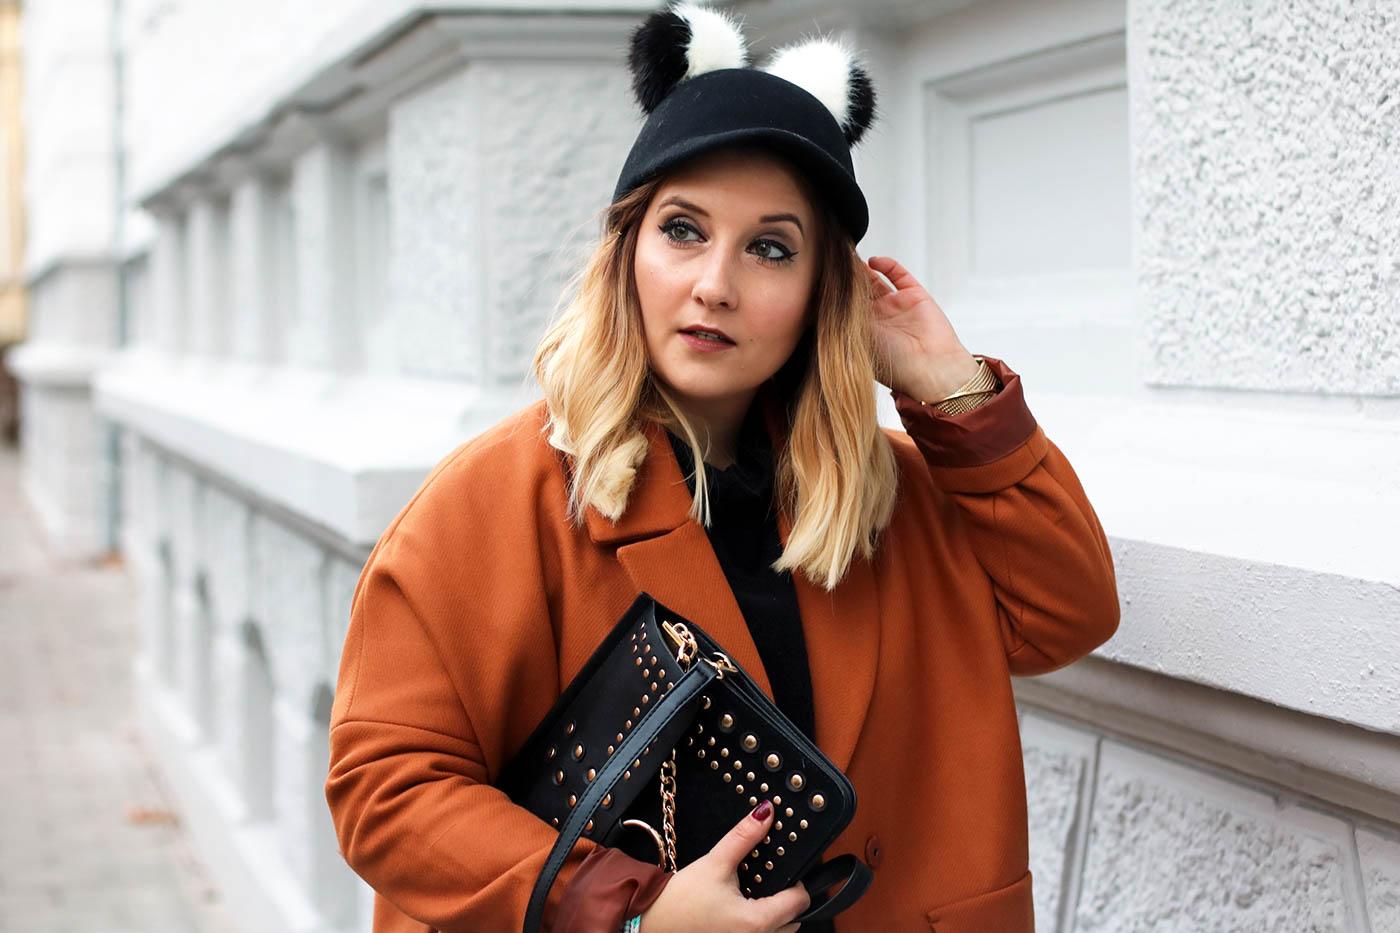 outfit-look-style-mantel-cappe-fashionblog-modeblog-gewinnspiel11